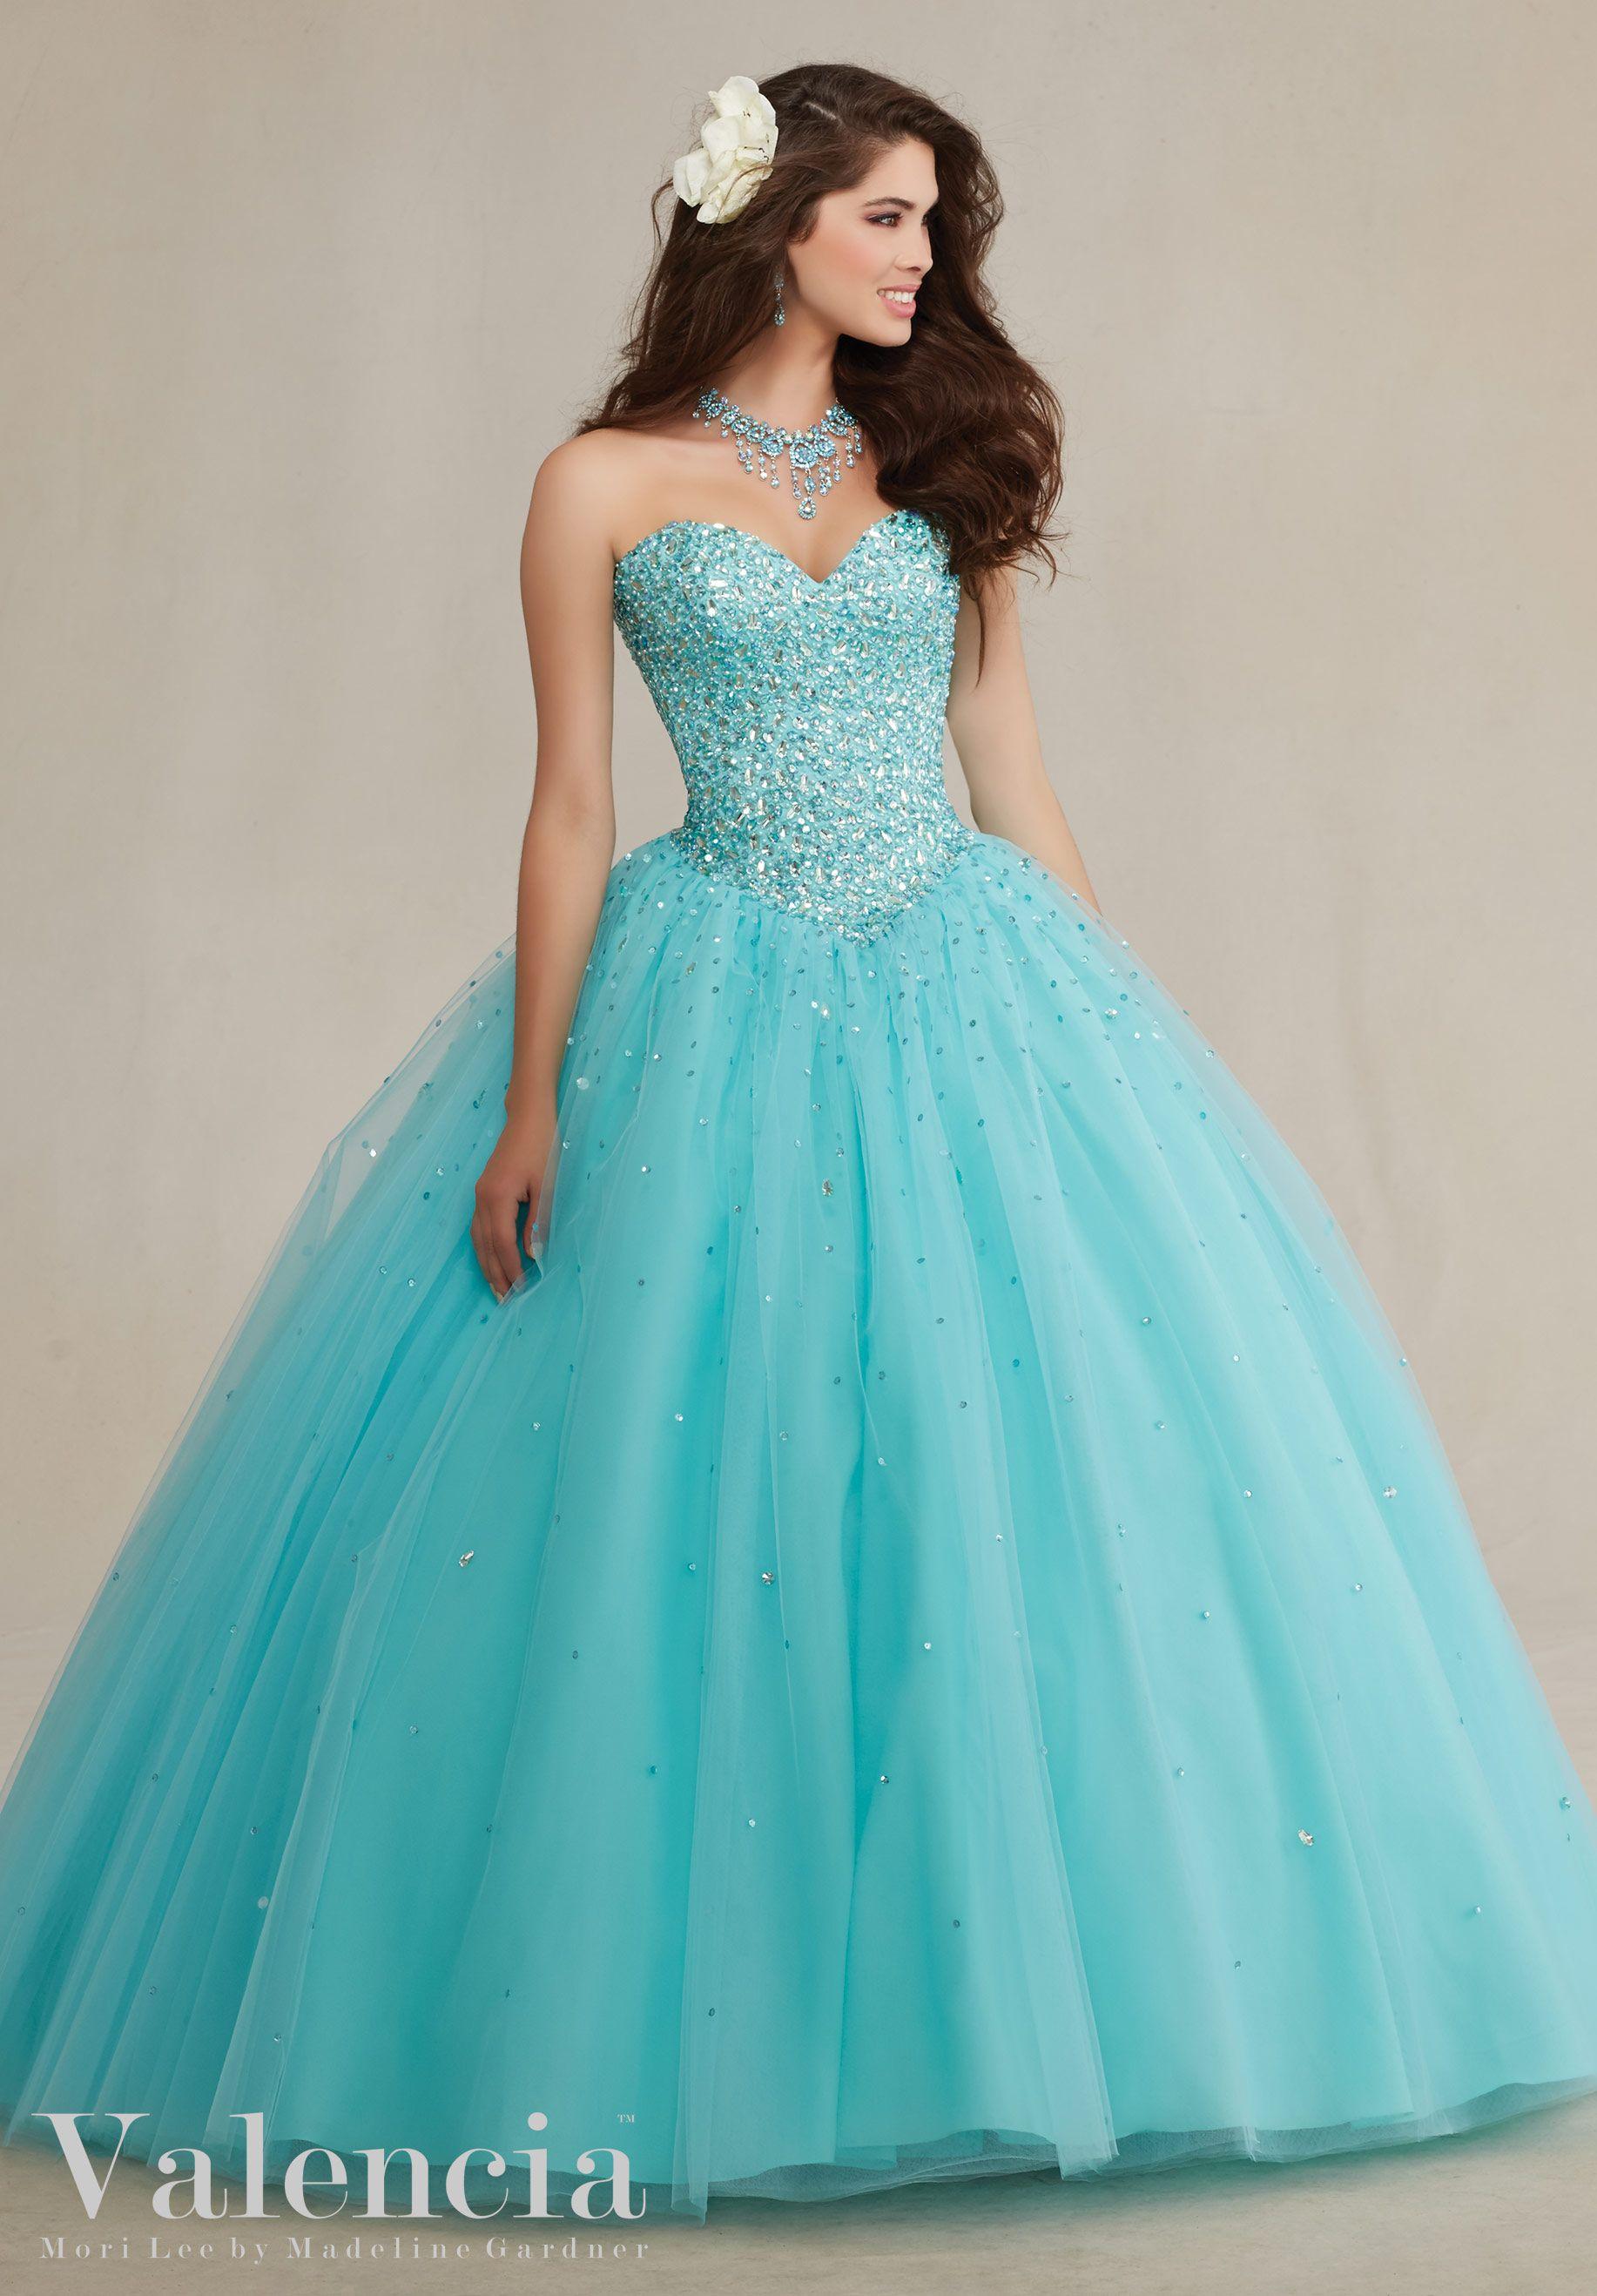 10544fc8352 Quinceanera Dresses Teal